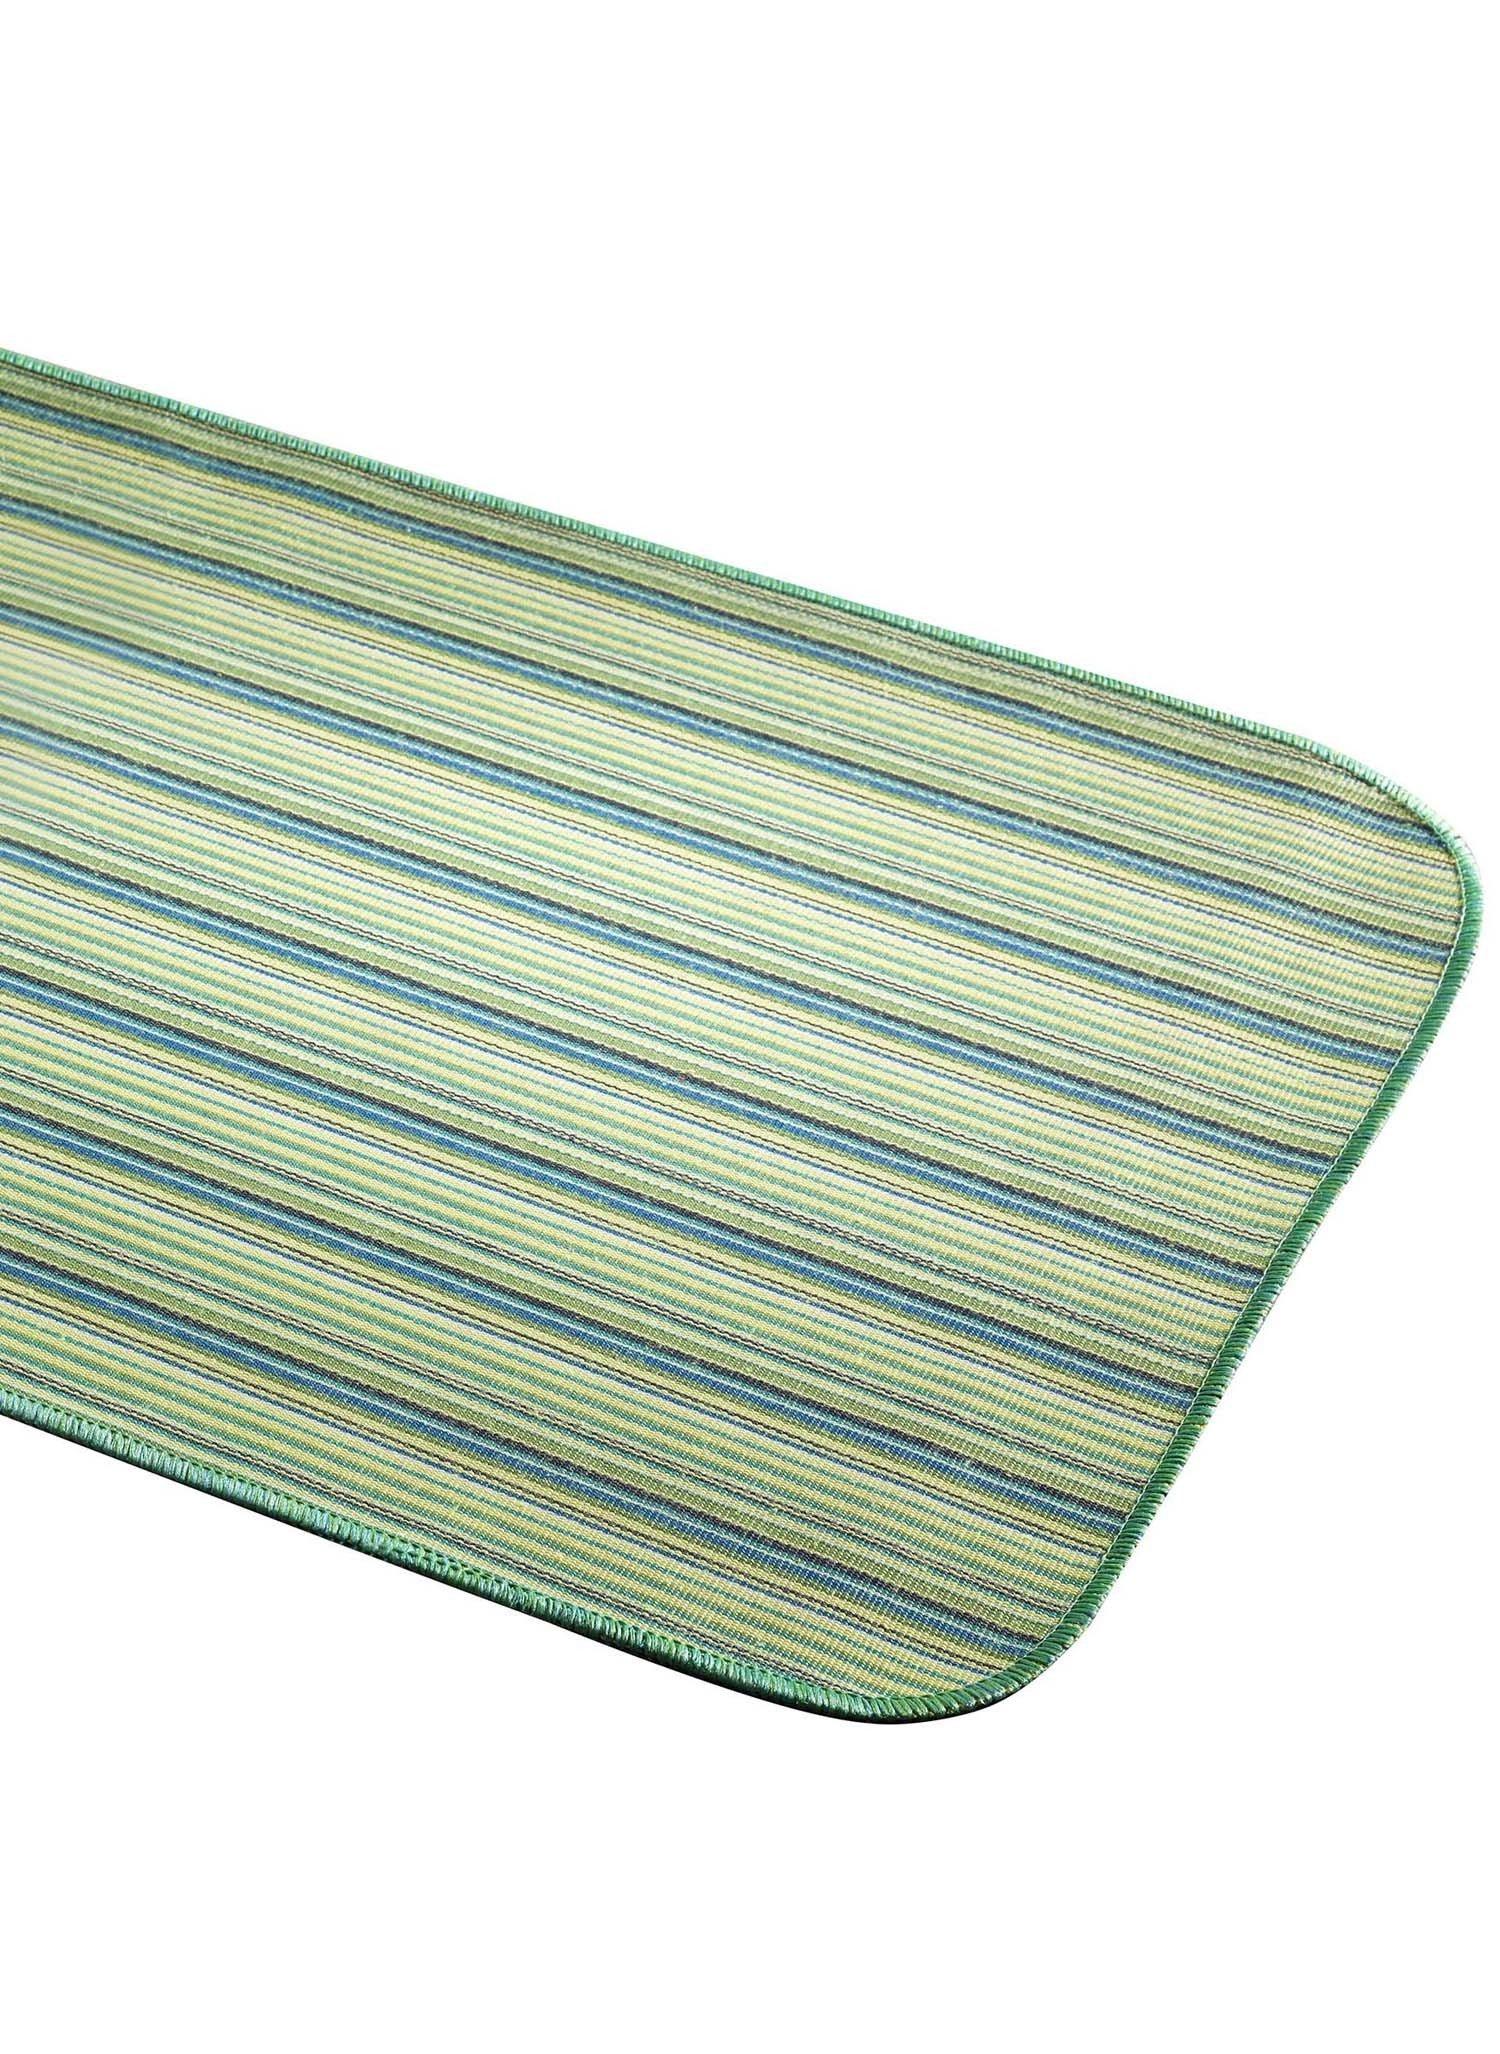 Küchen/Al.Teppich 57x115 grün - 3 - Ronja.ch